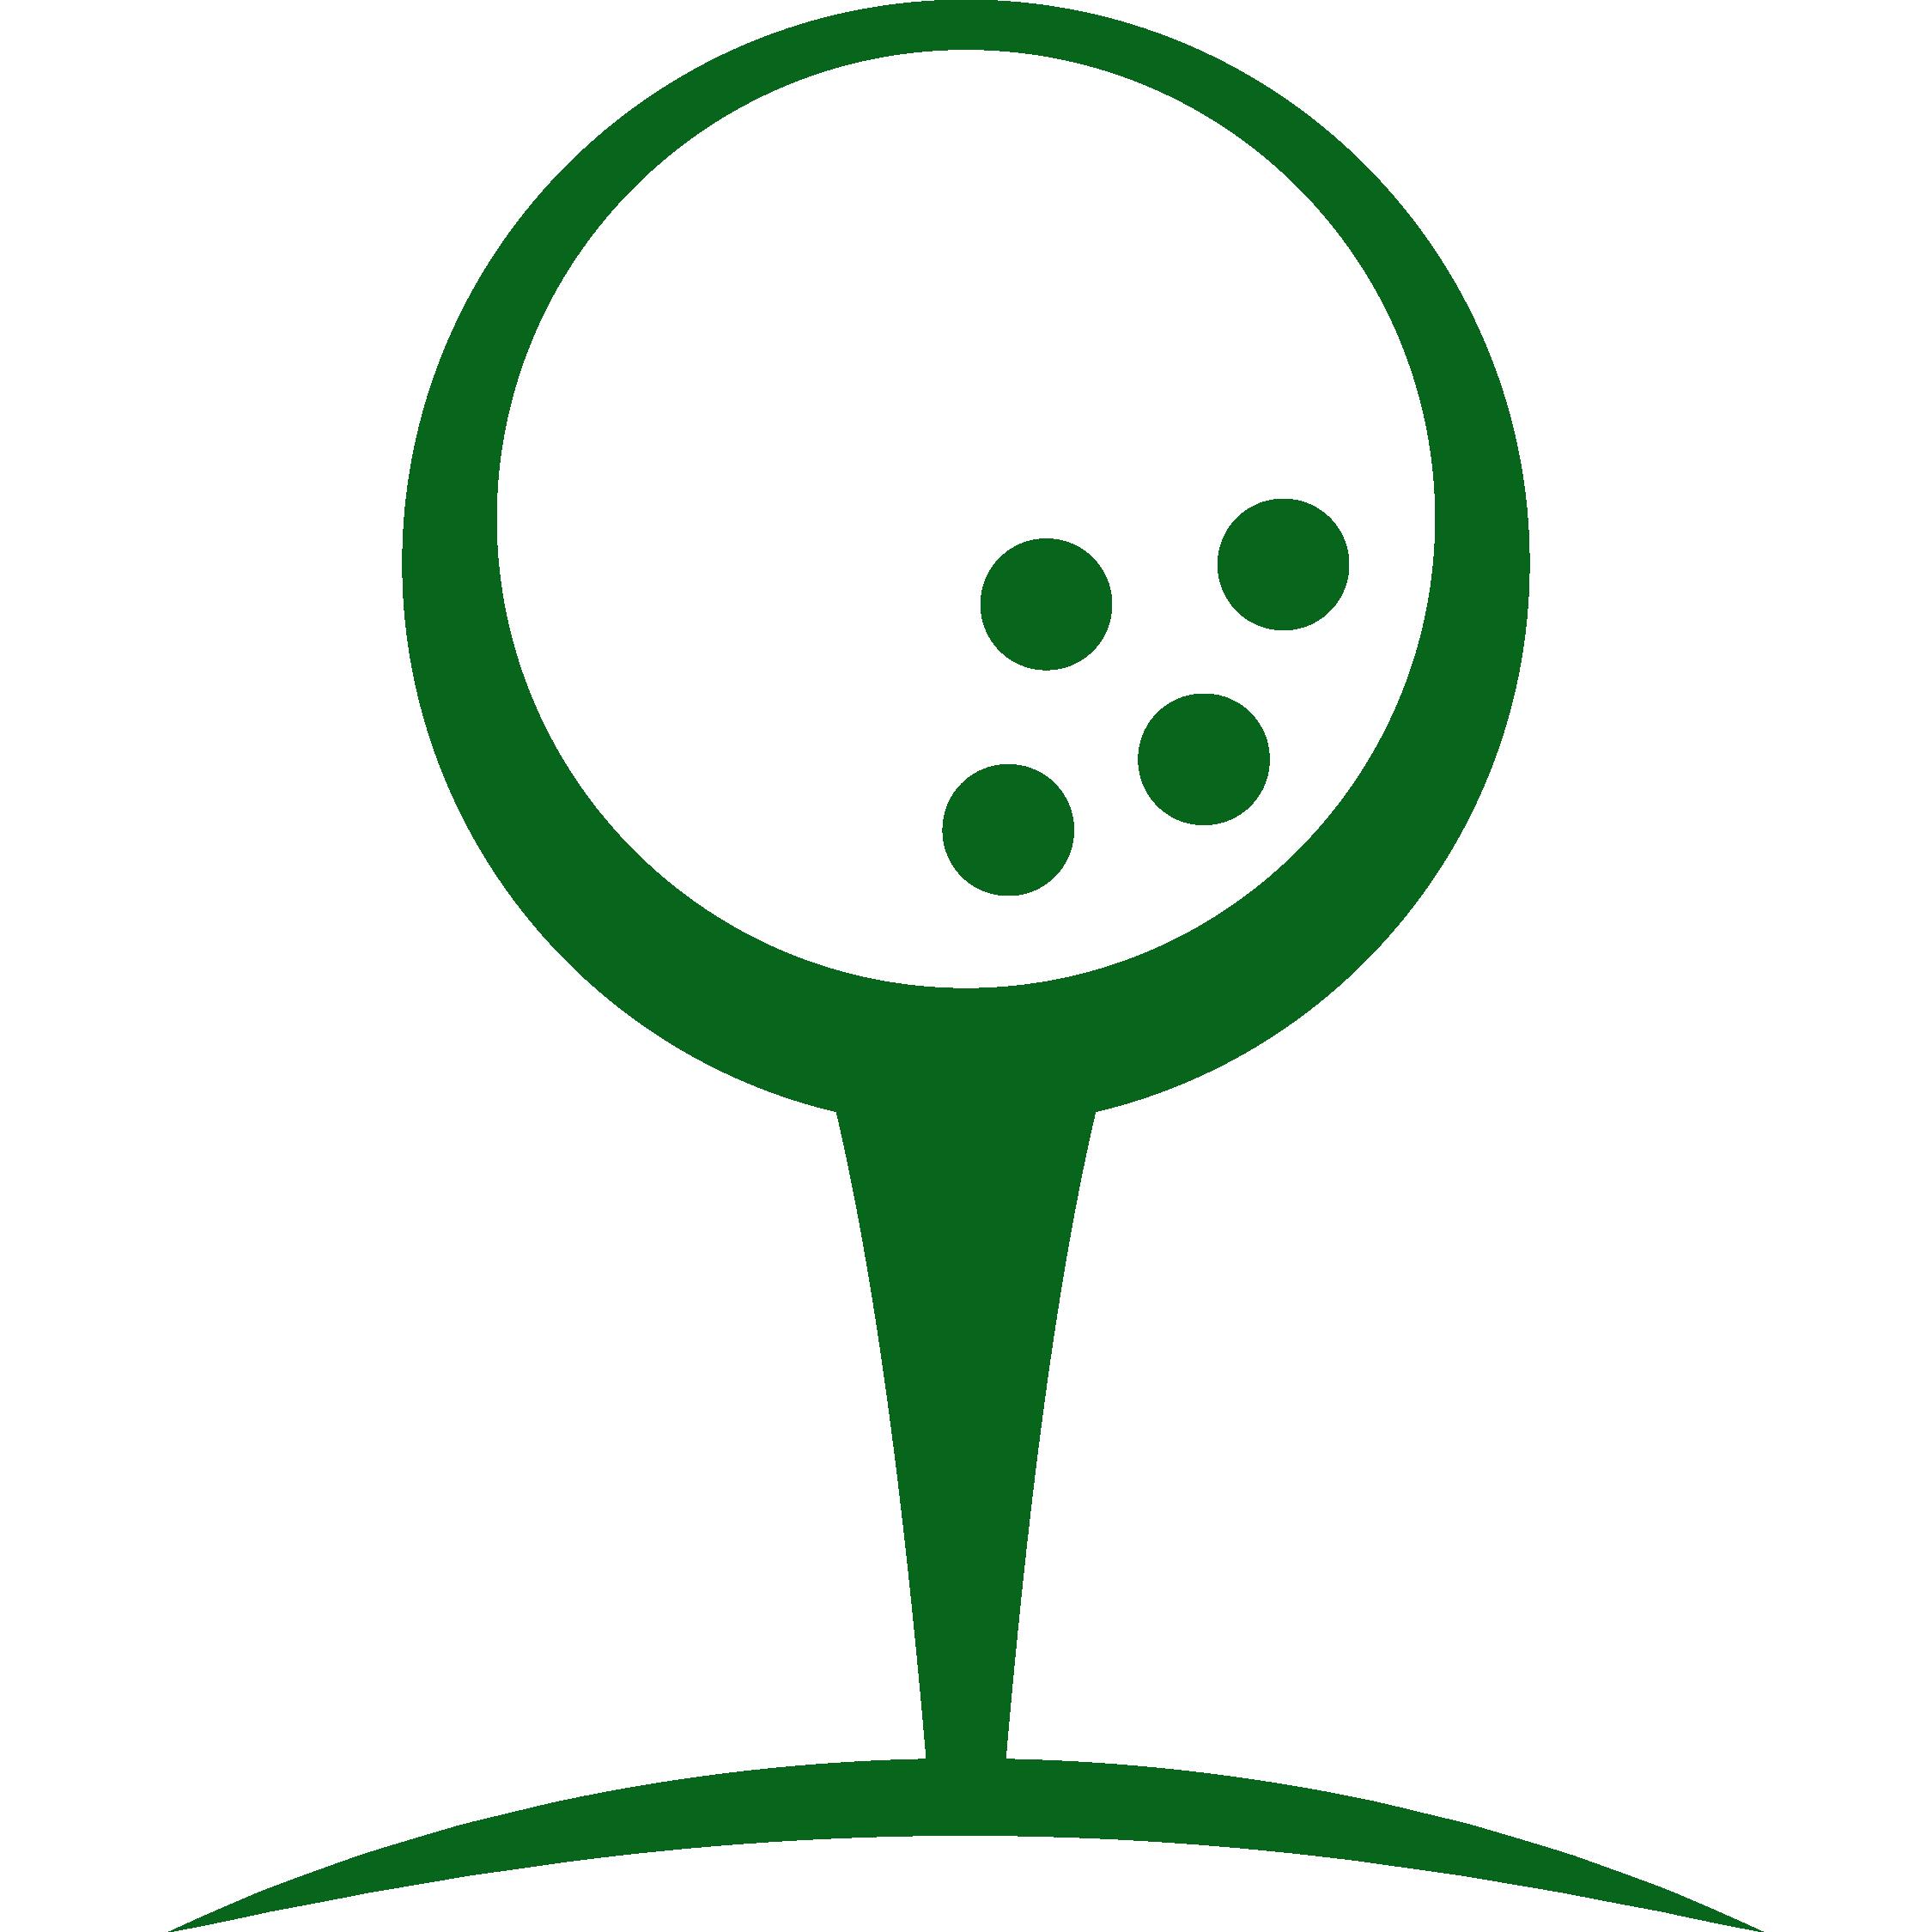 golf tee